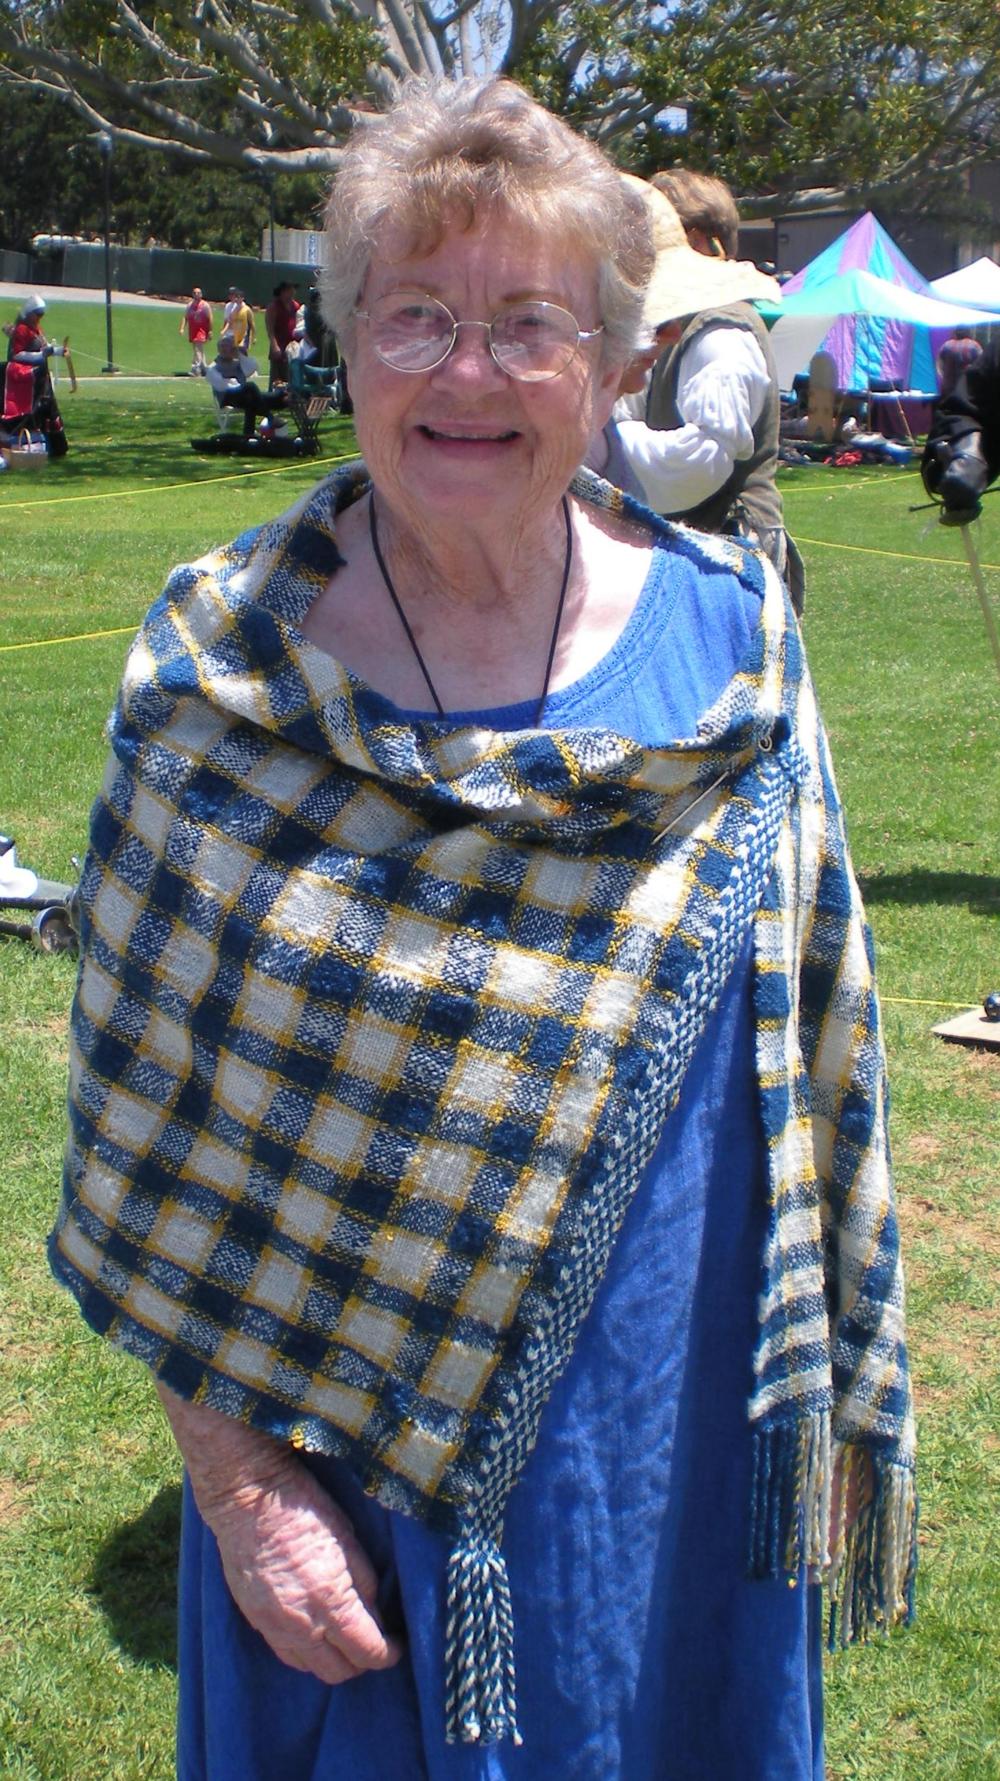 Bjo modeling shawl.jpg